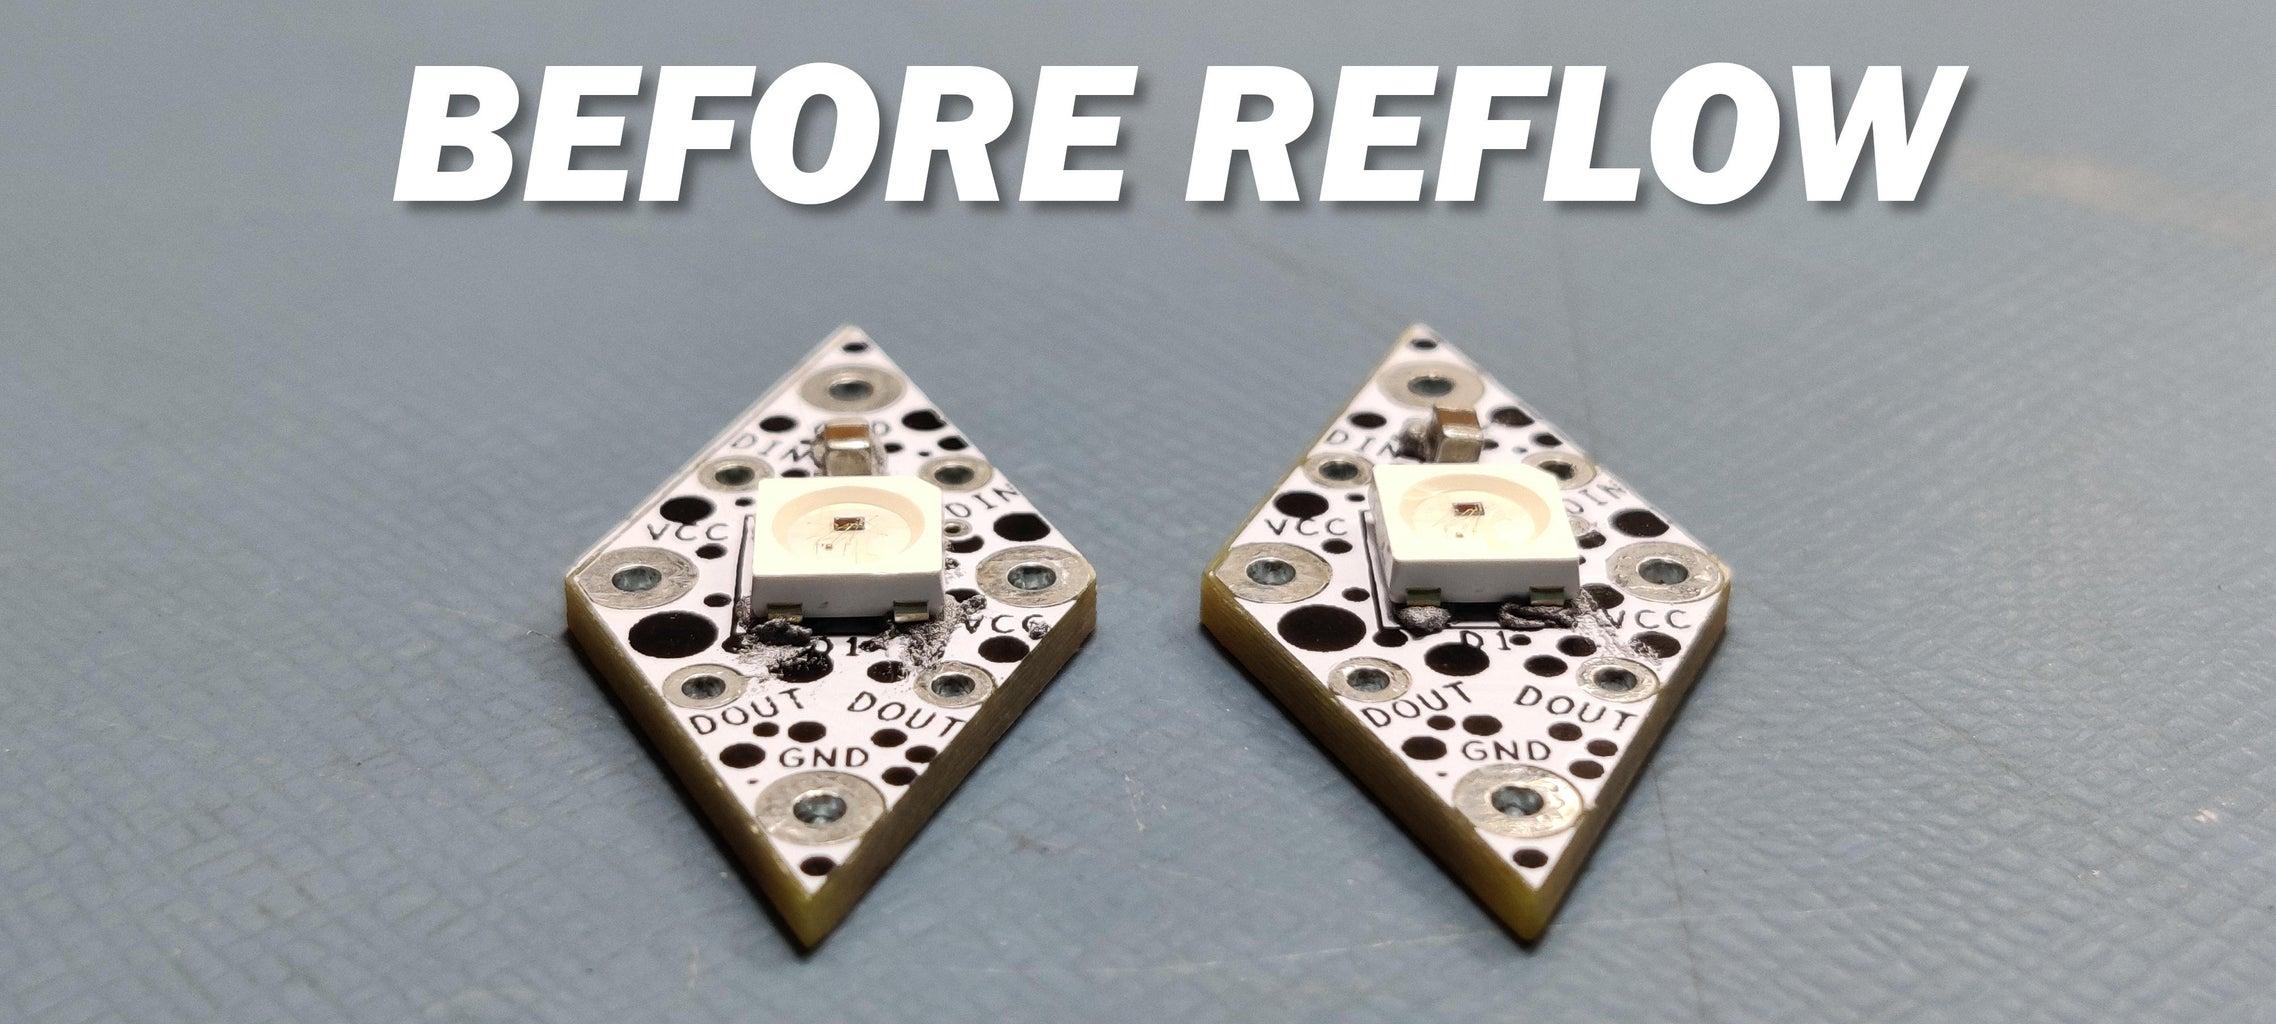 HOTPLATE Reflow